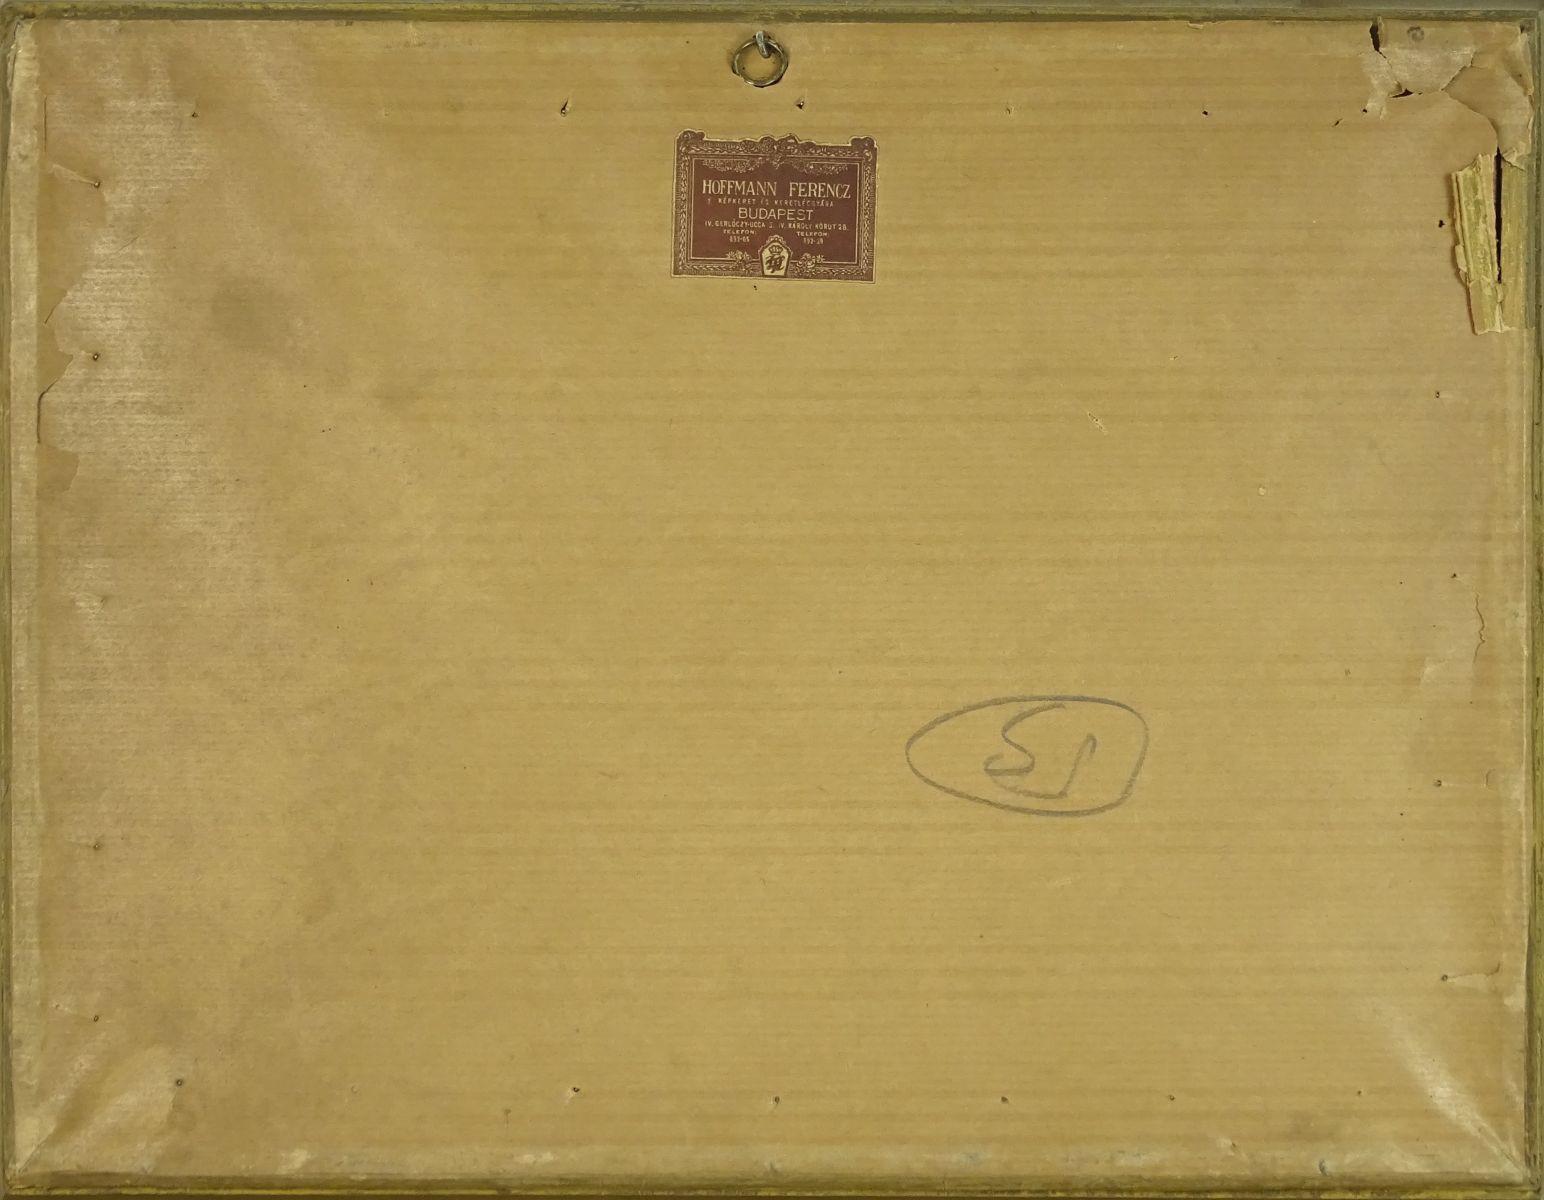 DSC06451.JPG (1544×1200)